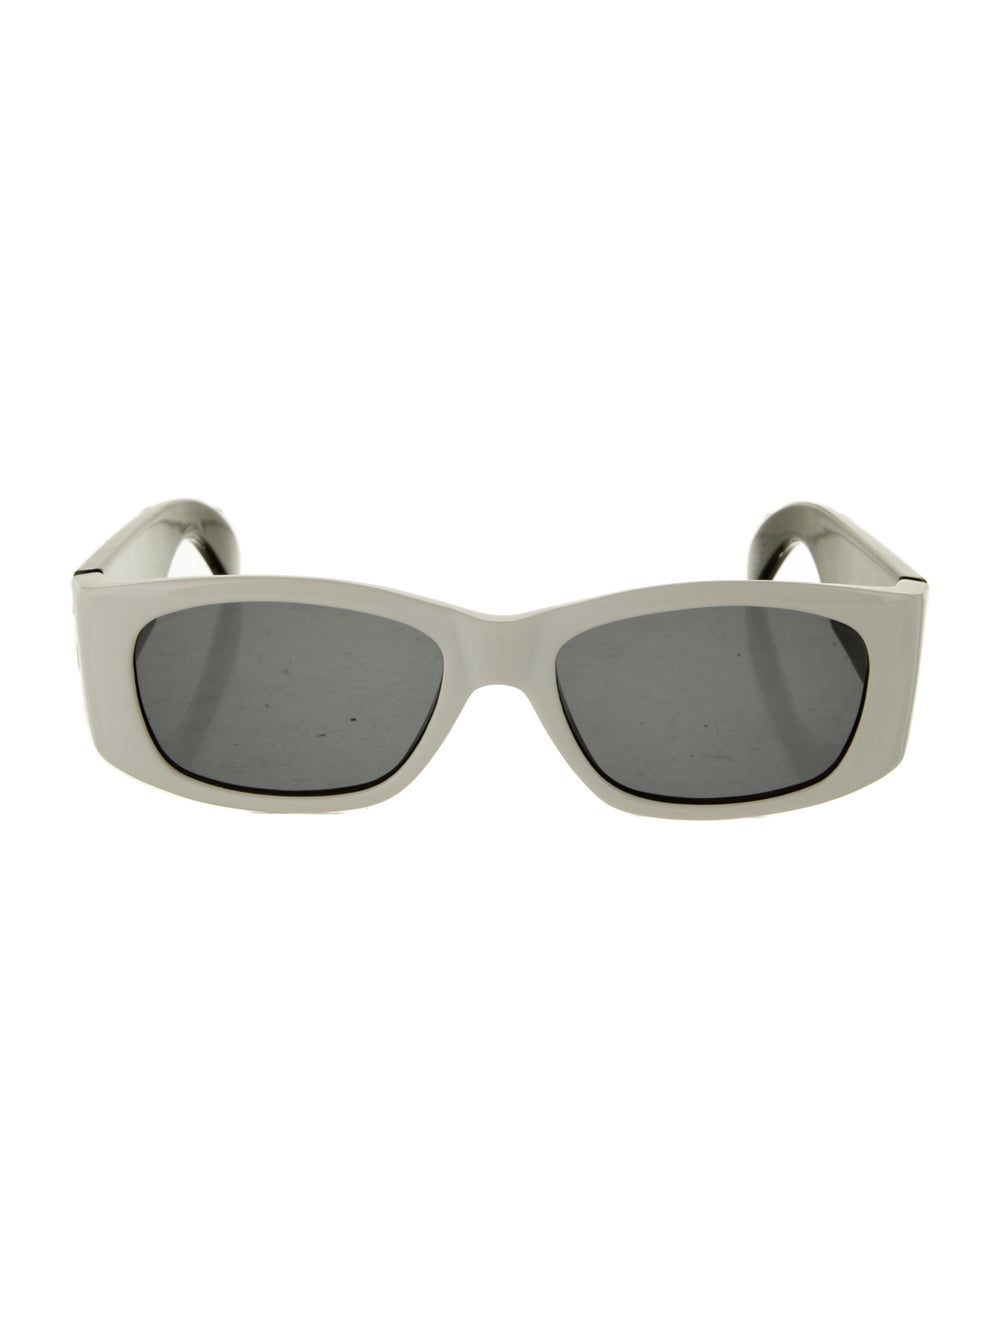 Gianni Versace Square Tinted Sunglasses Black - image 1